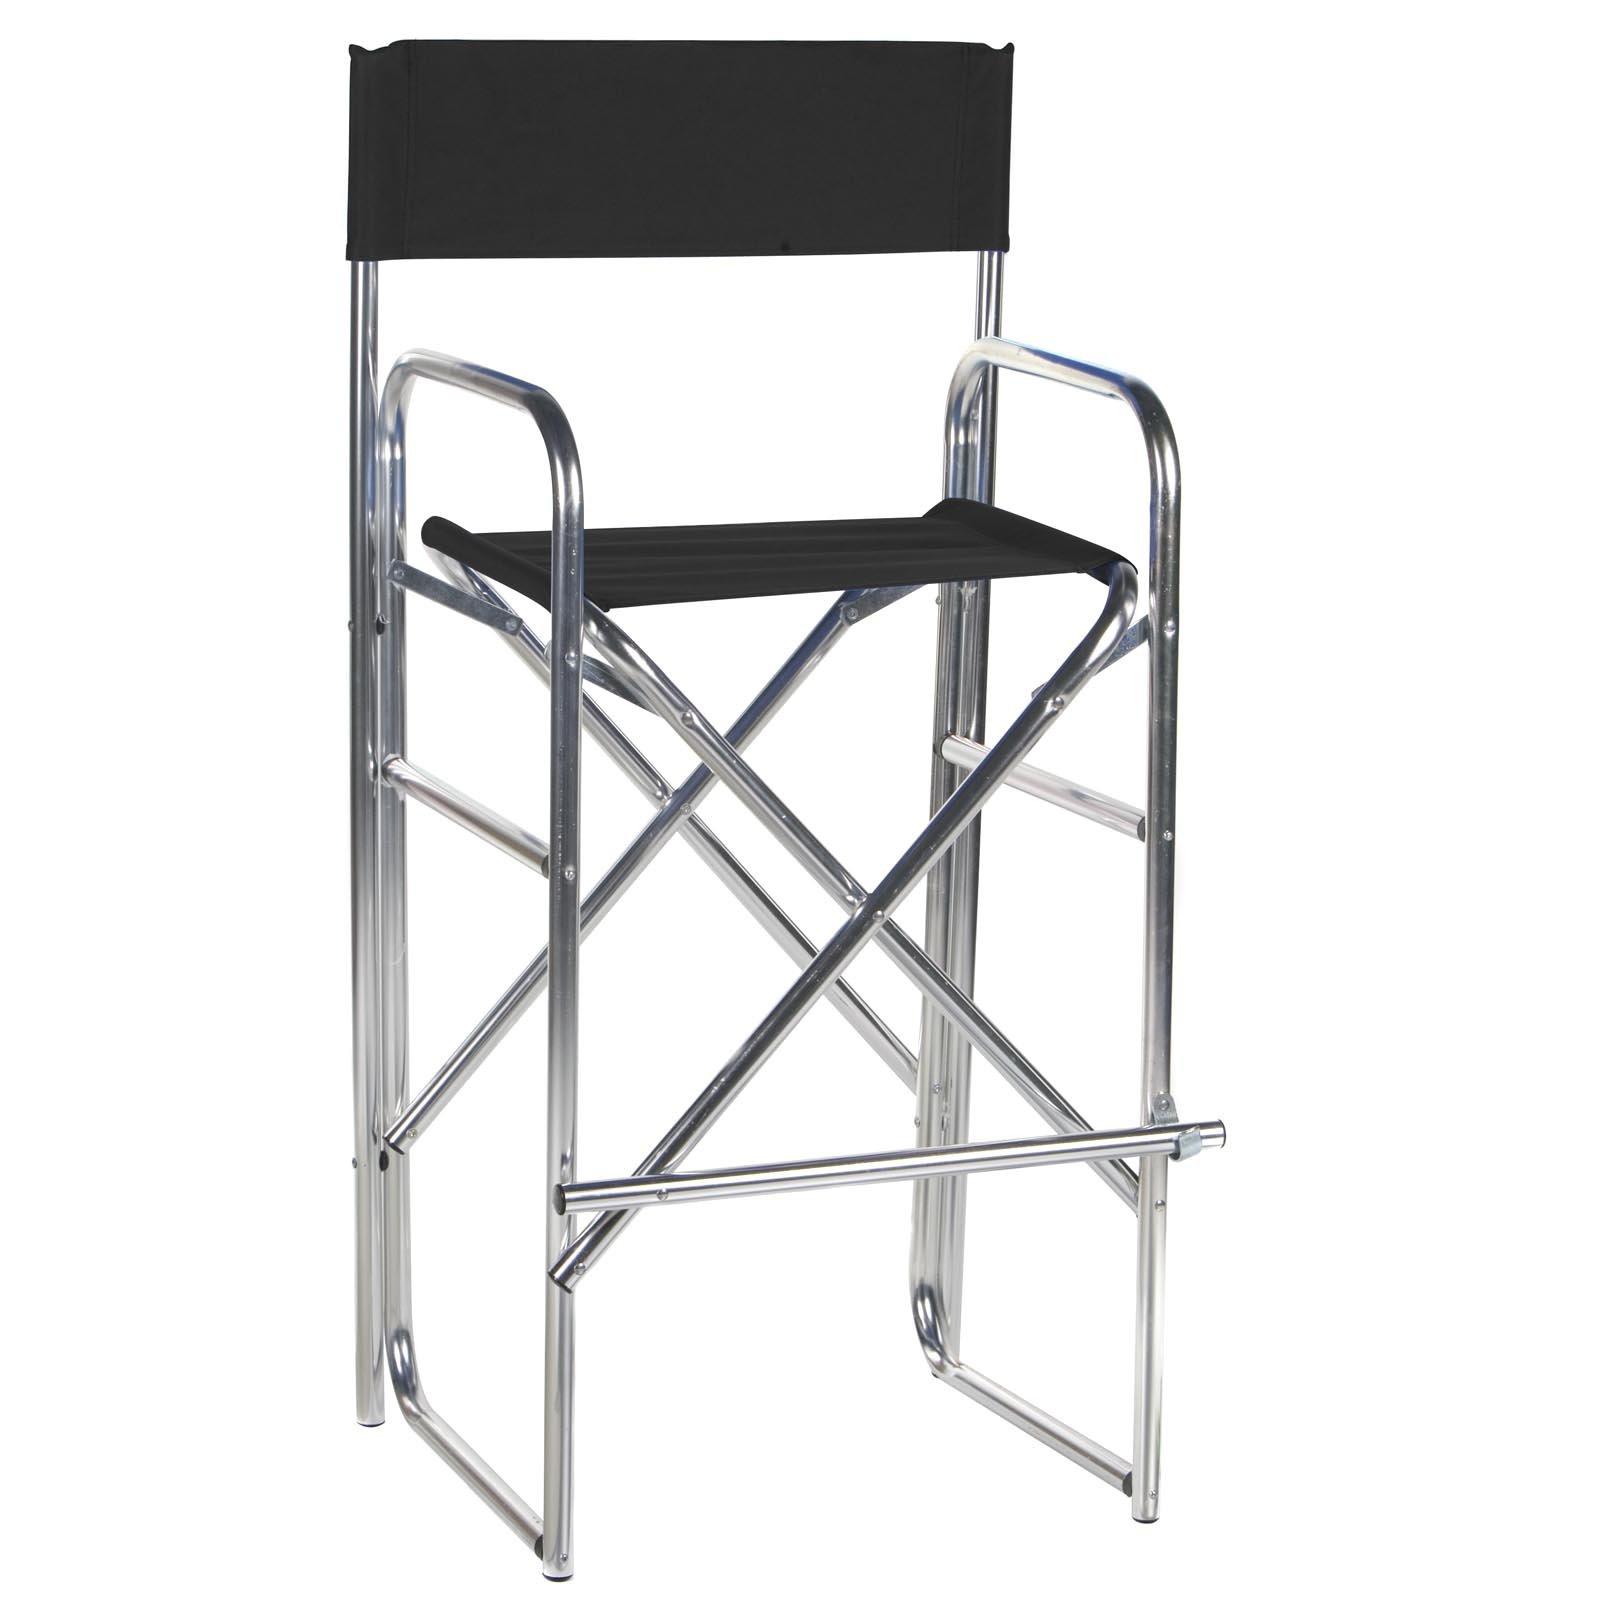 30.5 Inch Aluminum Frame Bar Height Directors Chair